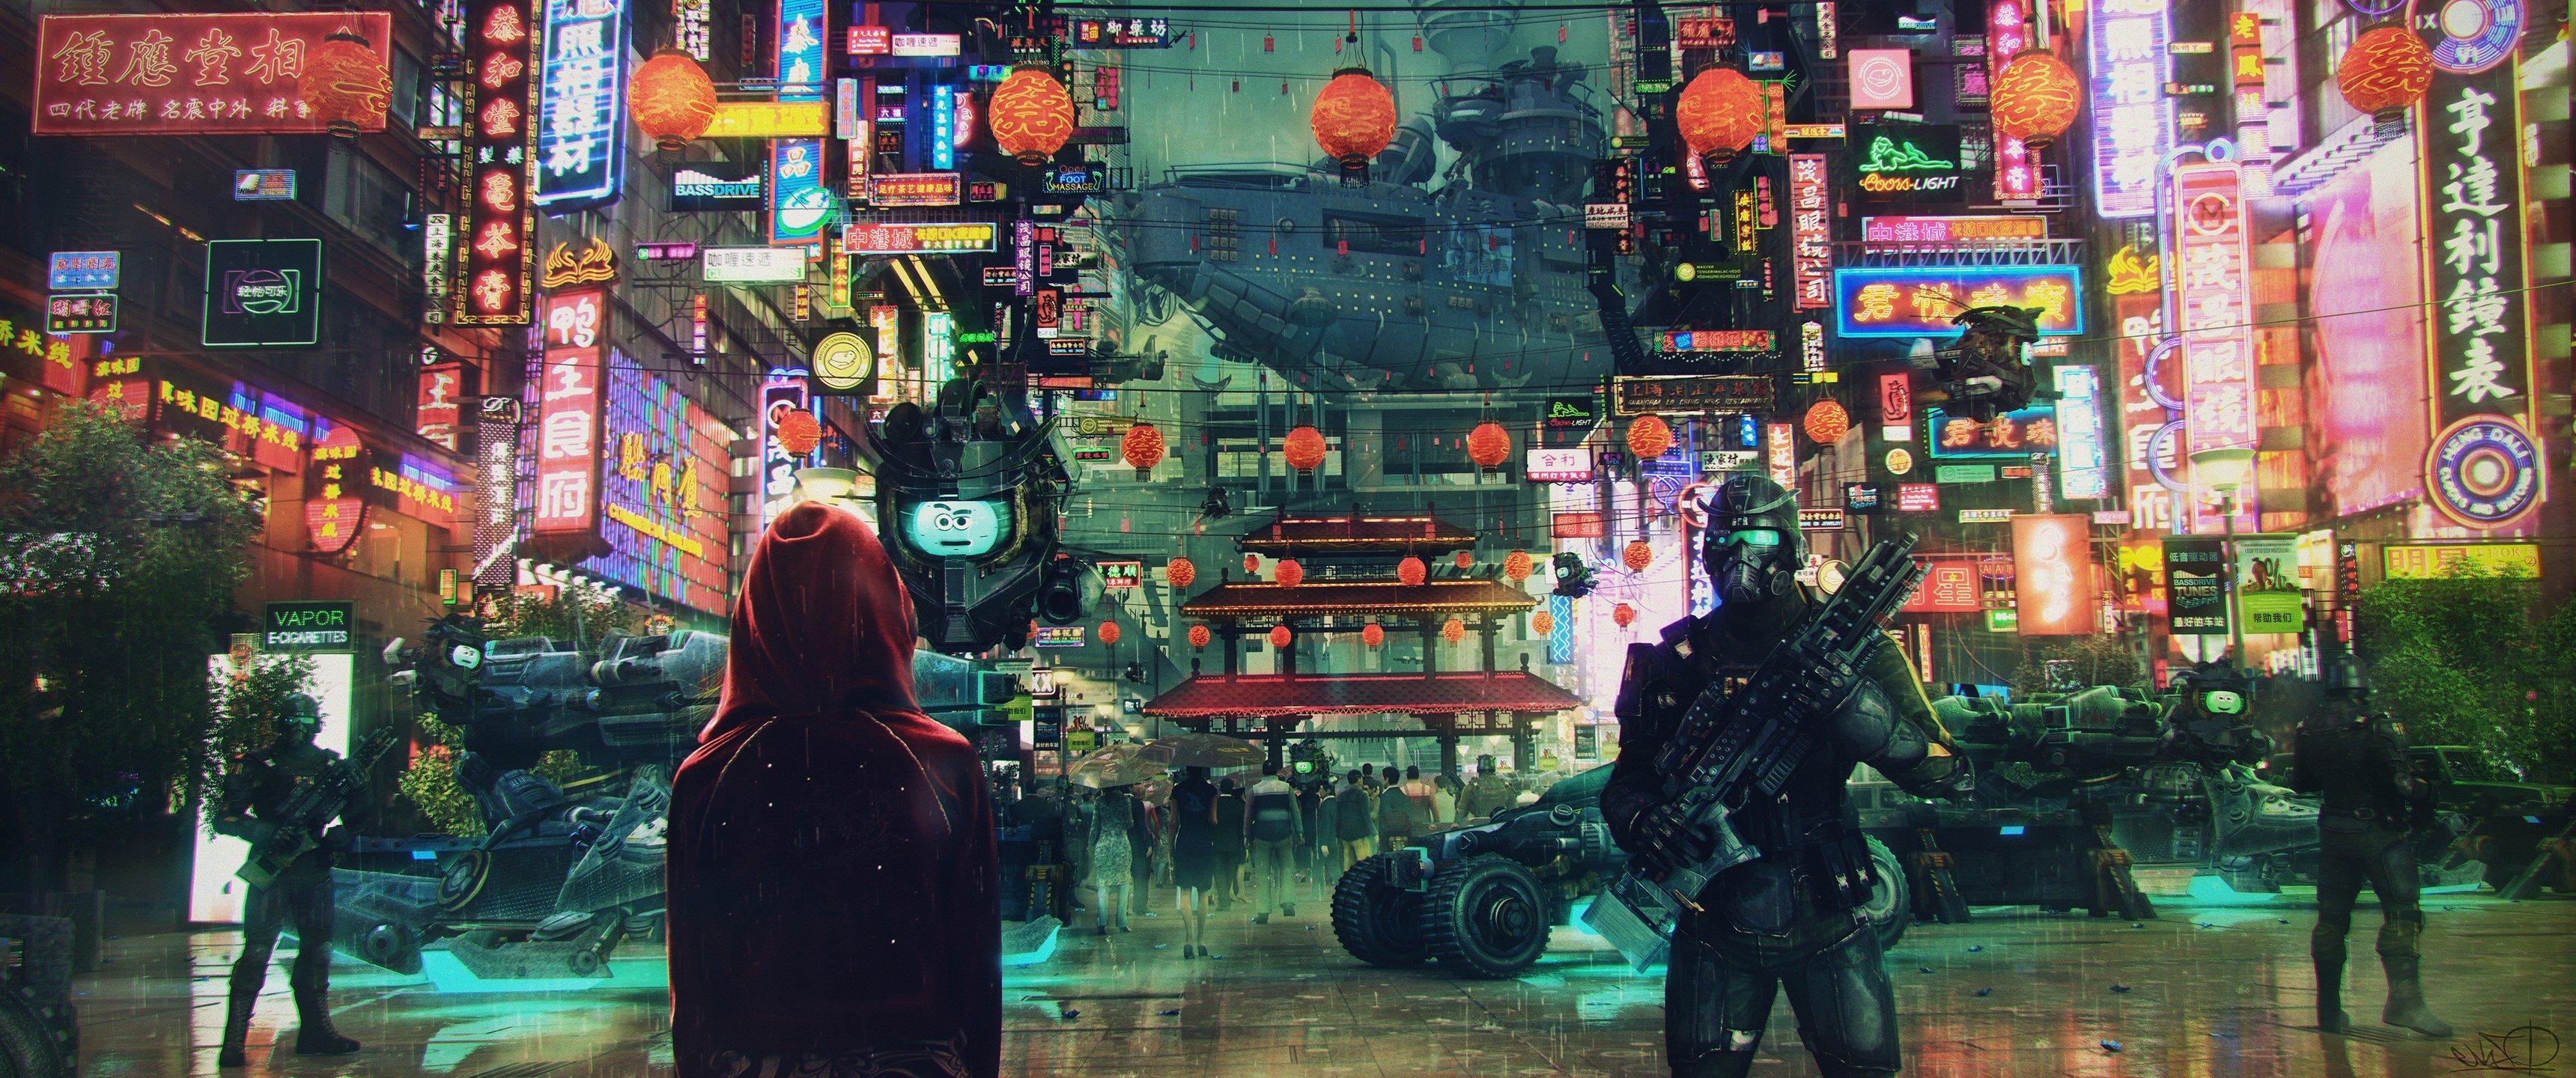 soldier, Science fiction, Cyberpunk